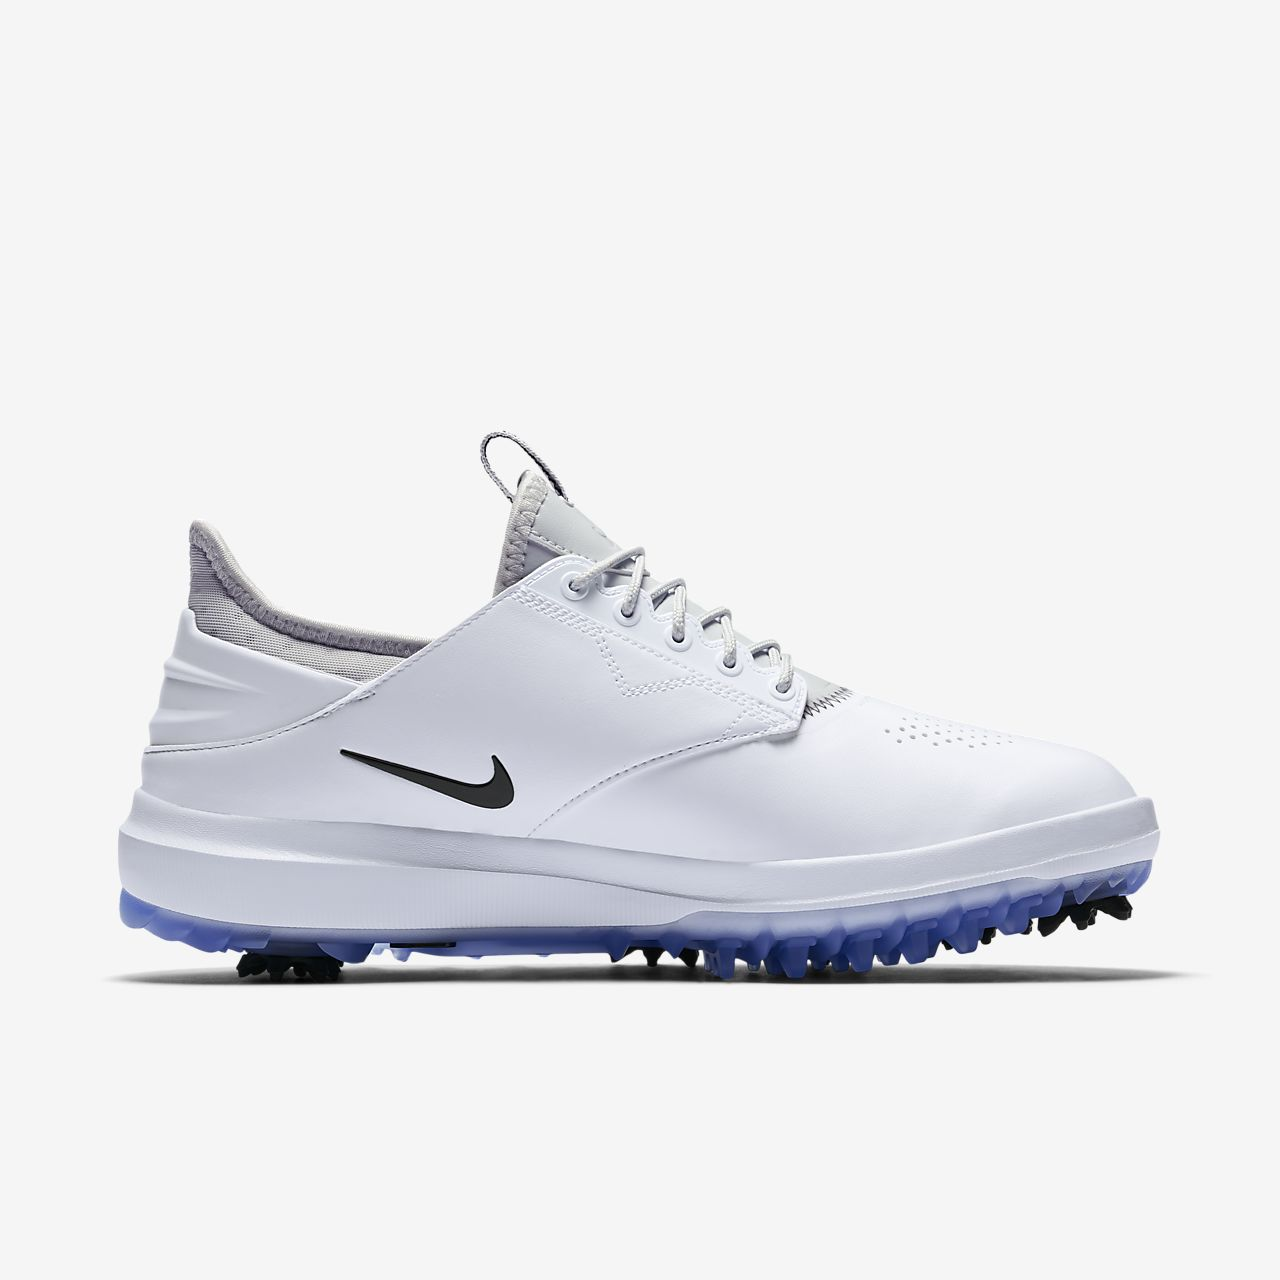 official photos 4c37f da5fa ... Golfsko Nike Air Zoom Direct för män